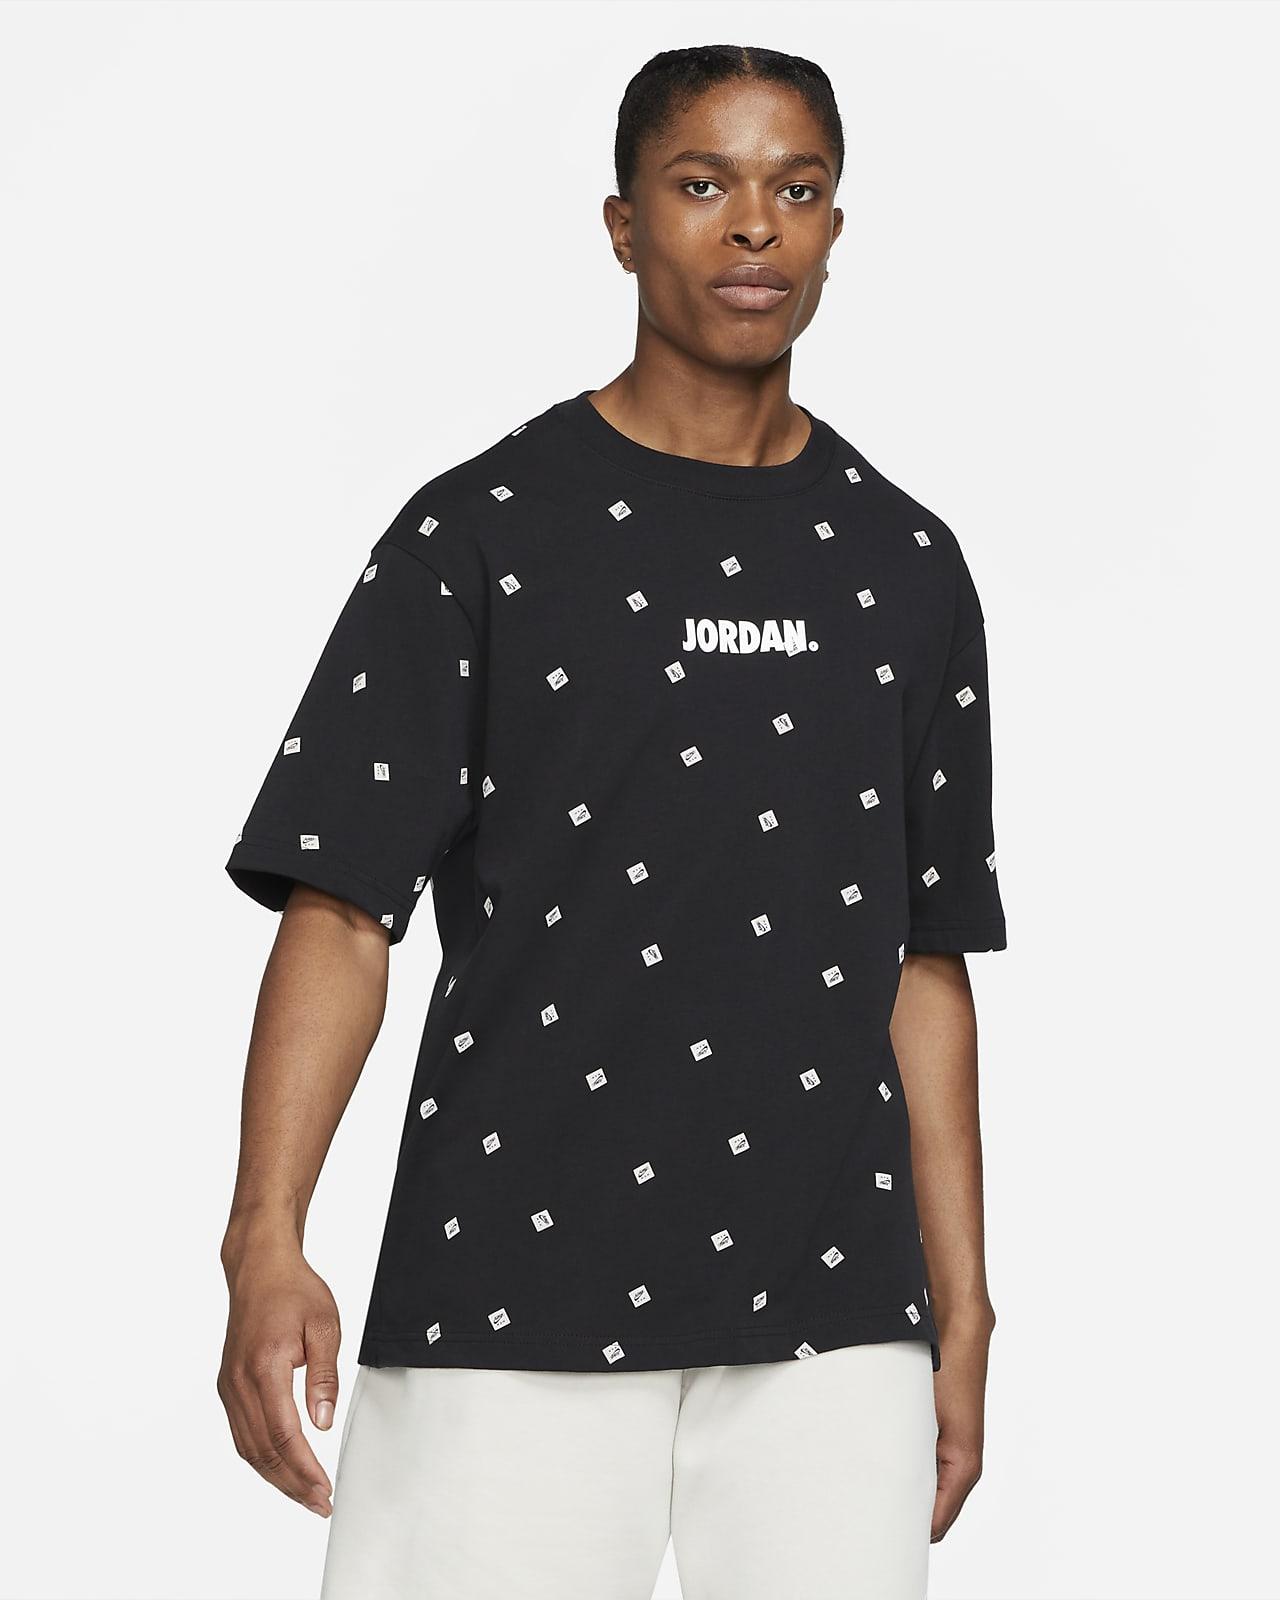 Jordan Jumpman Classics Herren-T-Shirt